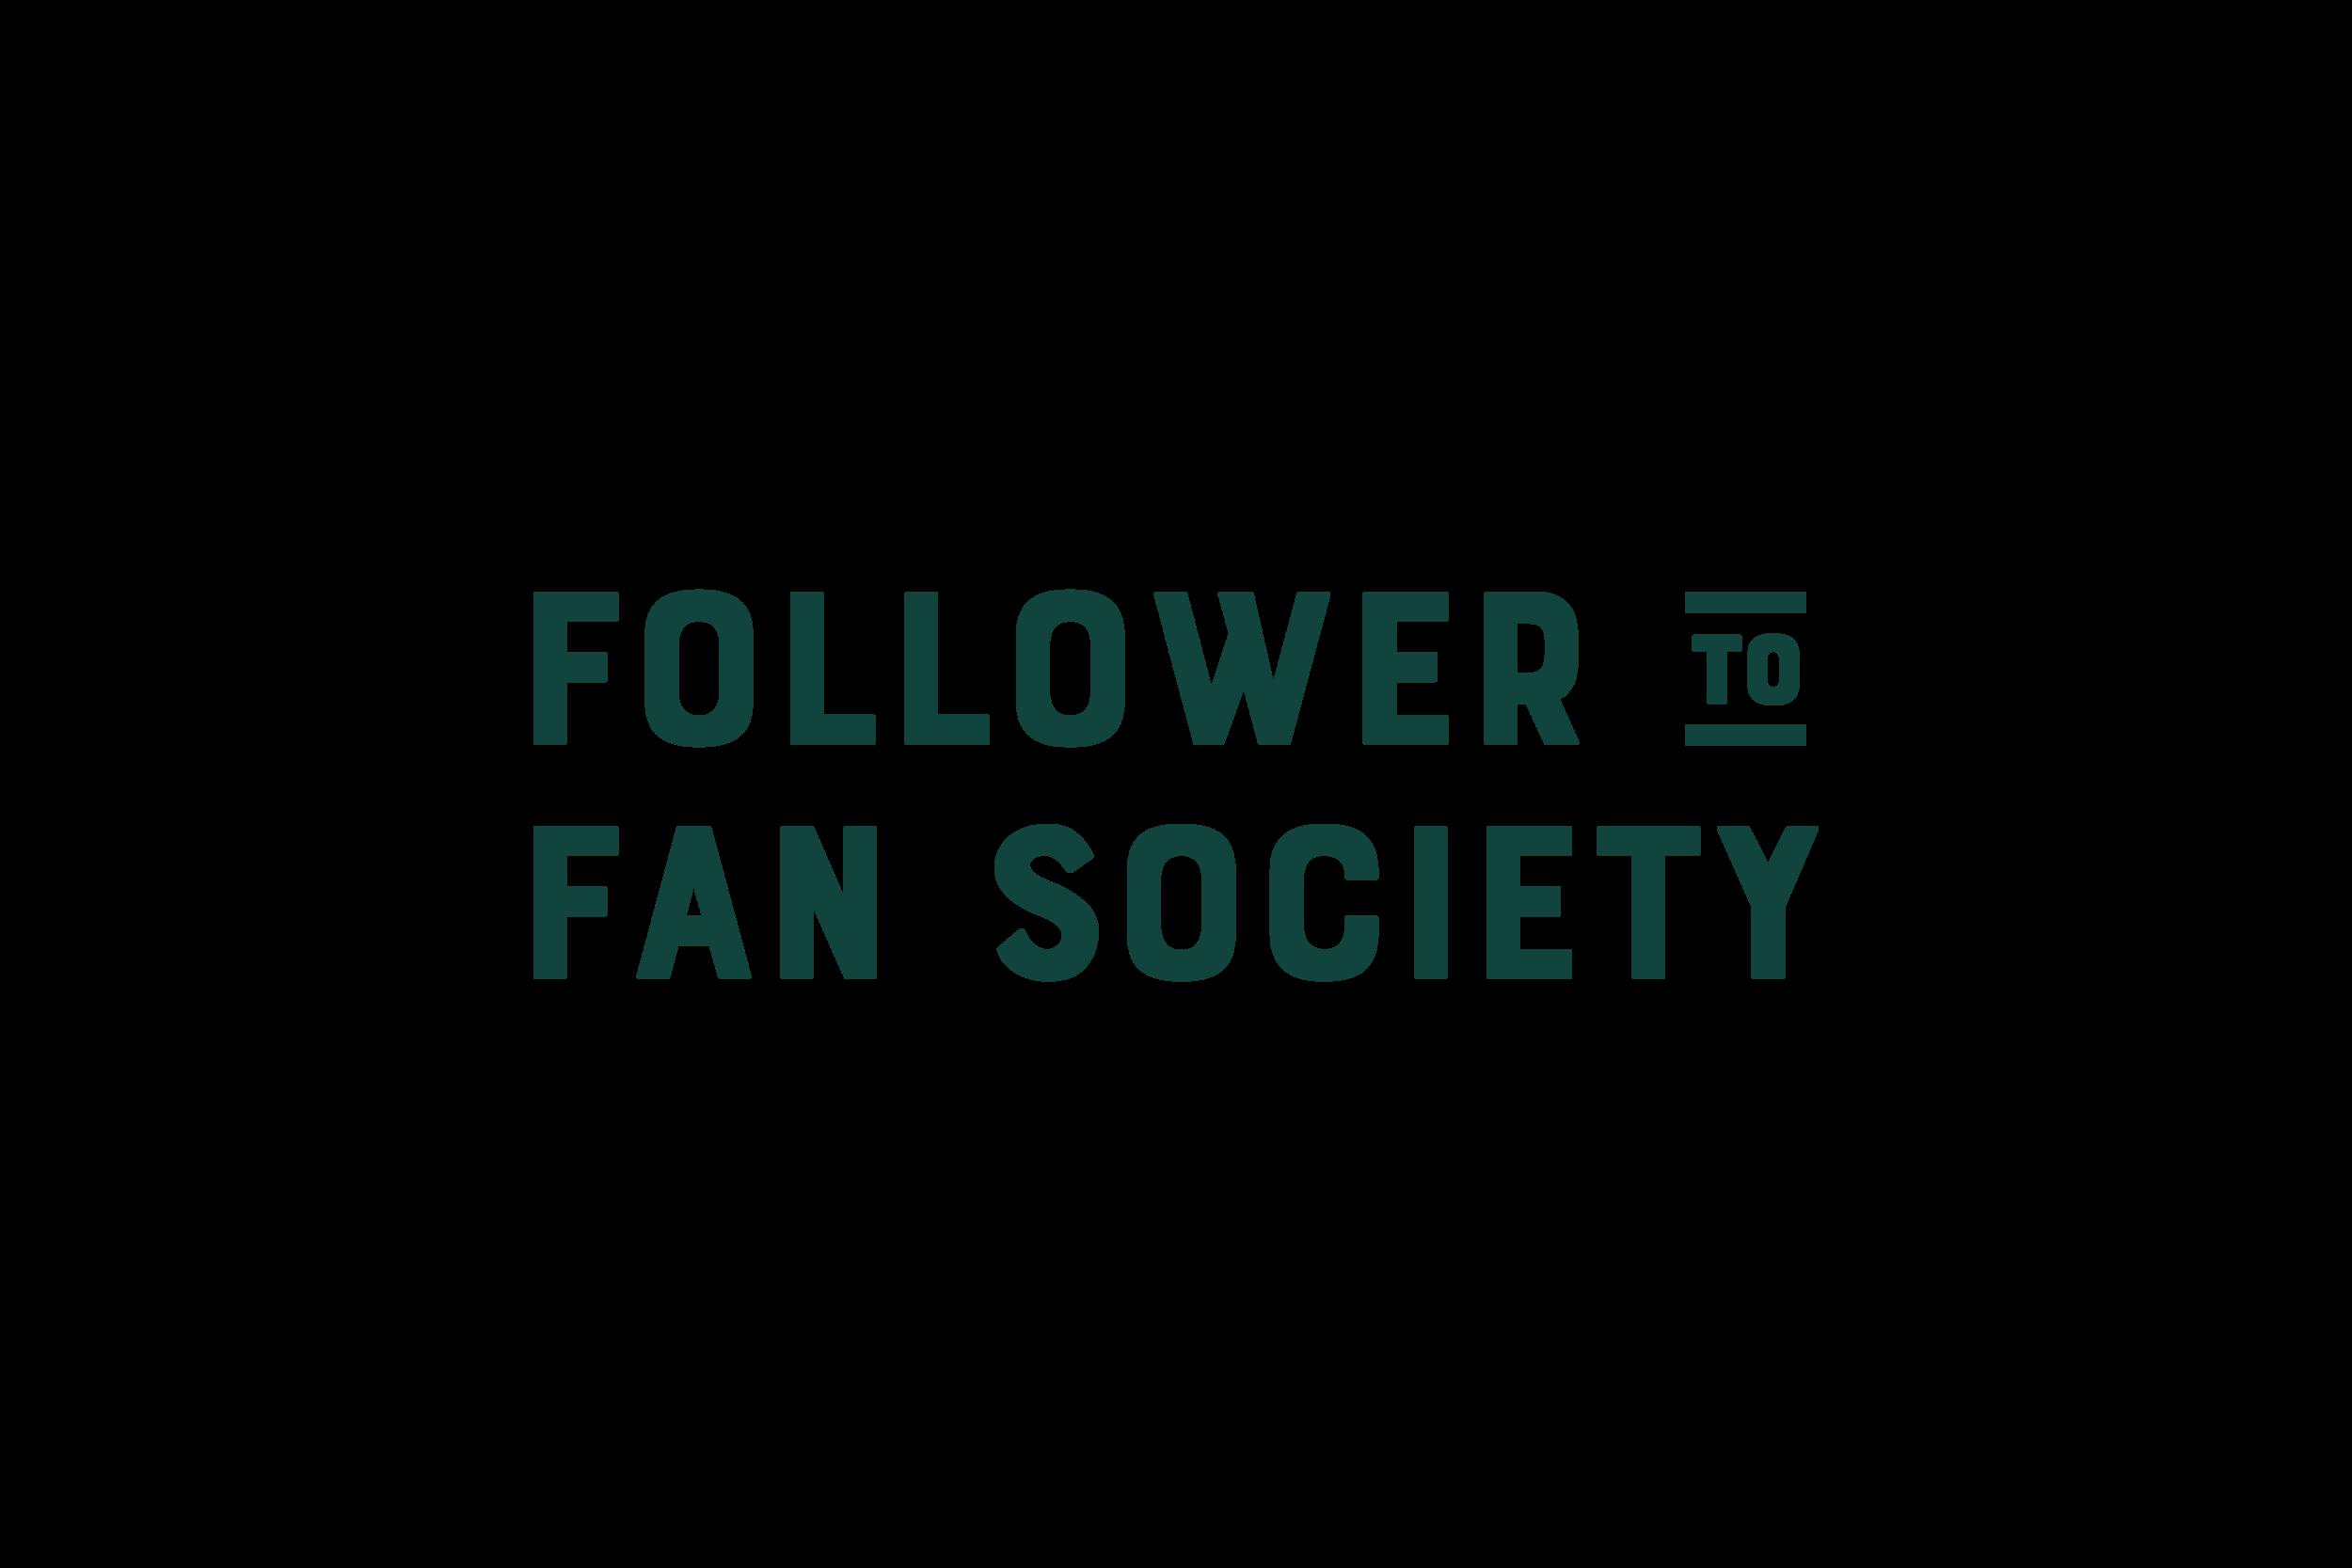 Follower to Fan Society Final-02.png